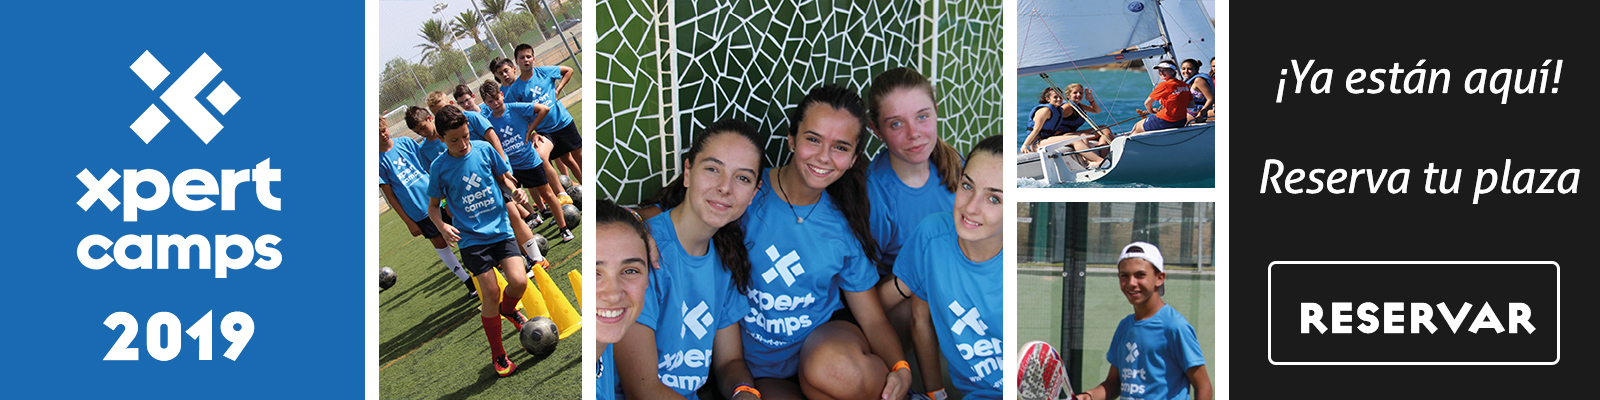 Campamentos de verano 2019 - XPERT-CAMPS